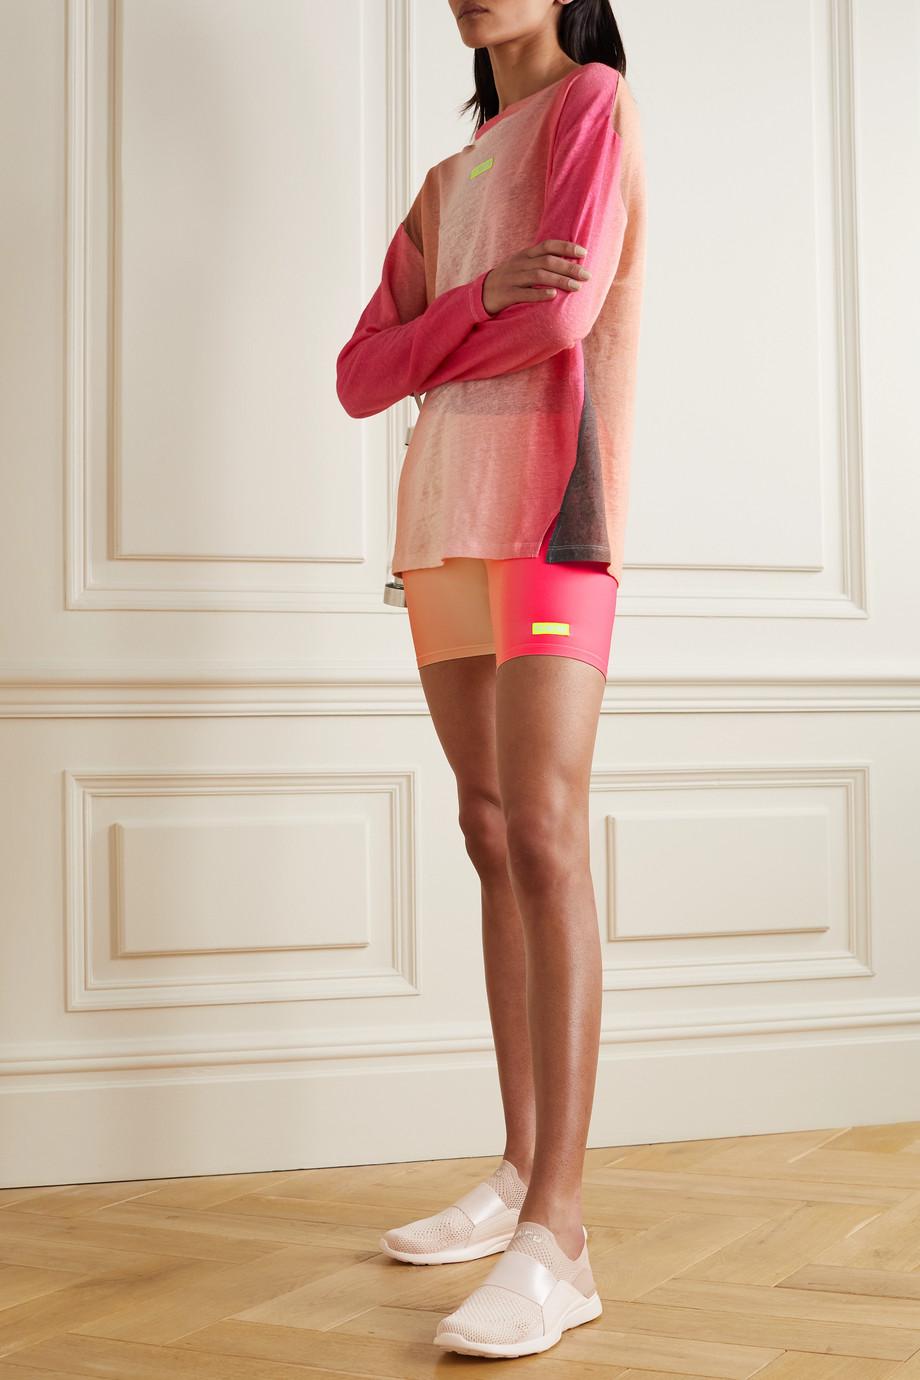 P.E NATION Momentum Shorts aus recyceltem Stretch-Material mit Farbverlauf